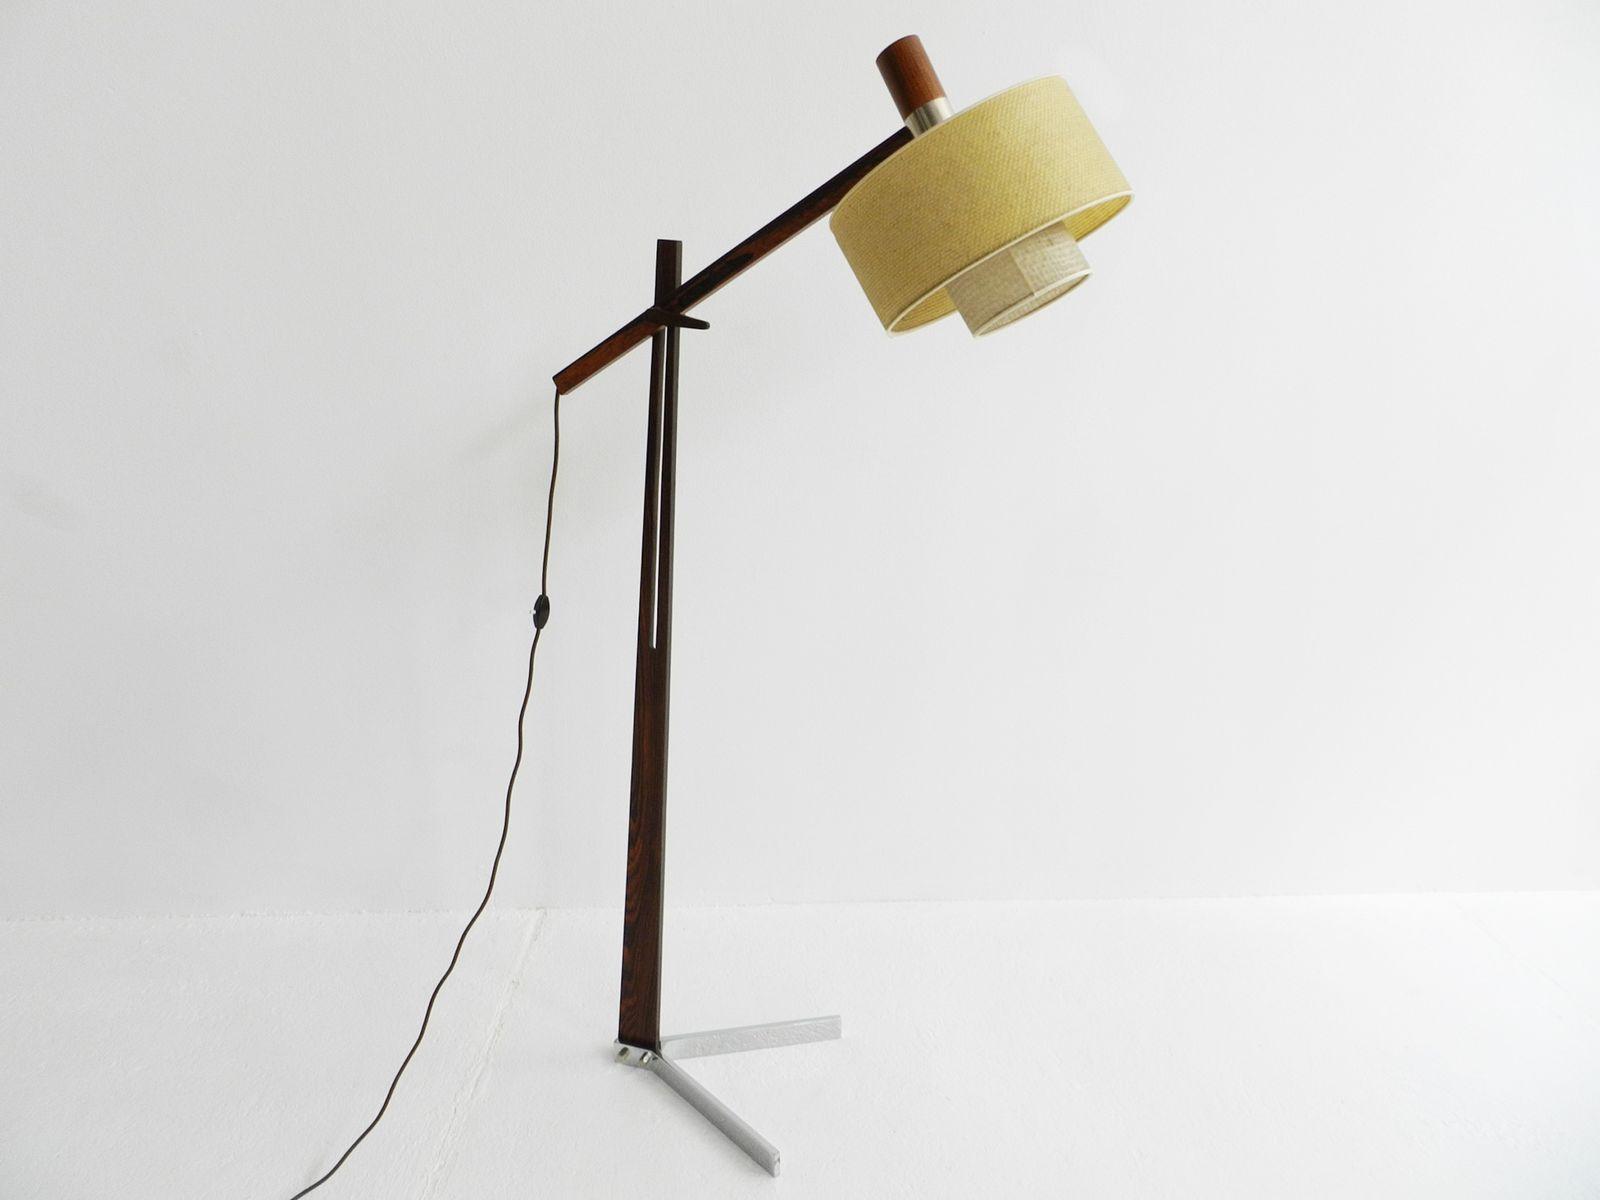 Verstellbare Palisander Stehlampe, 1960er